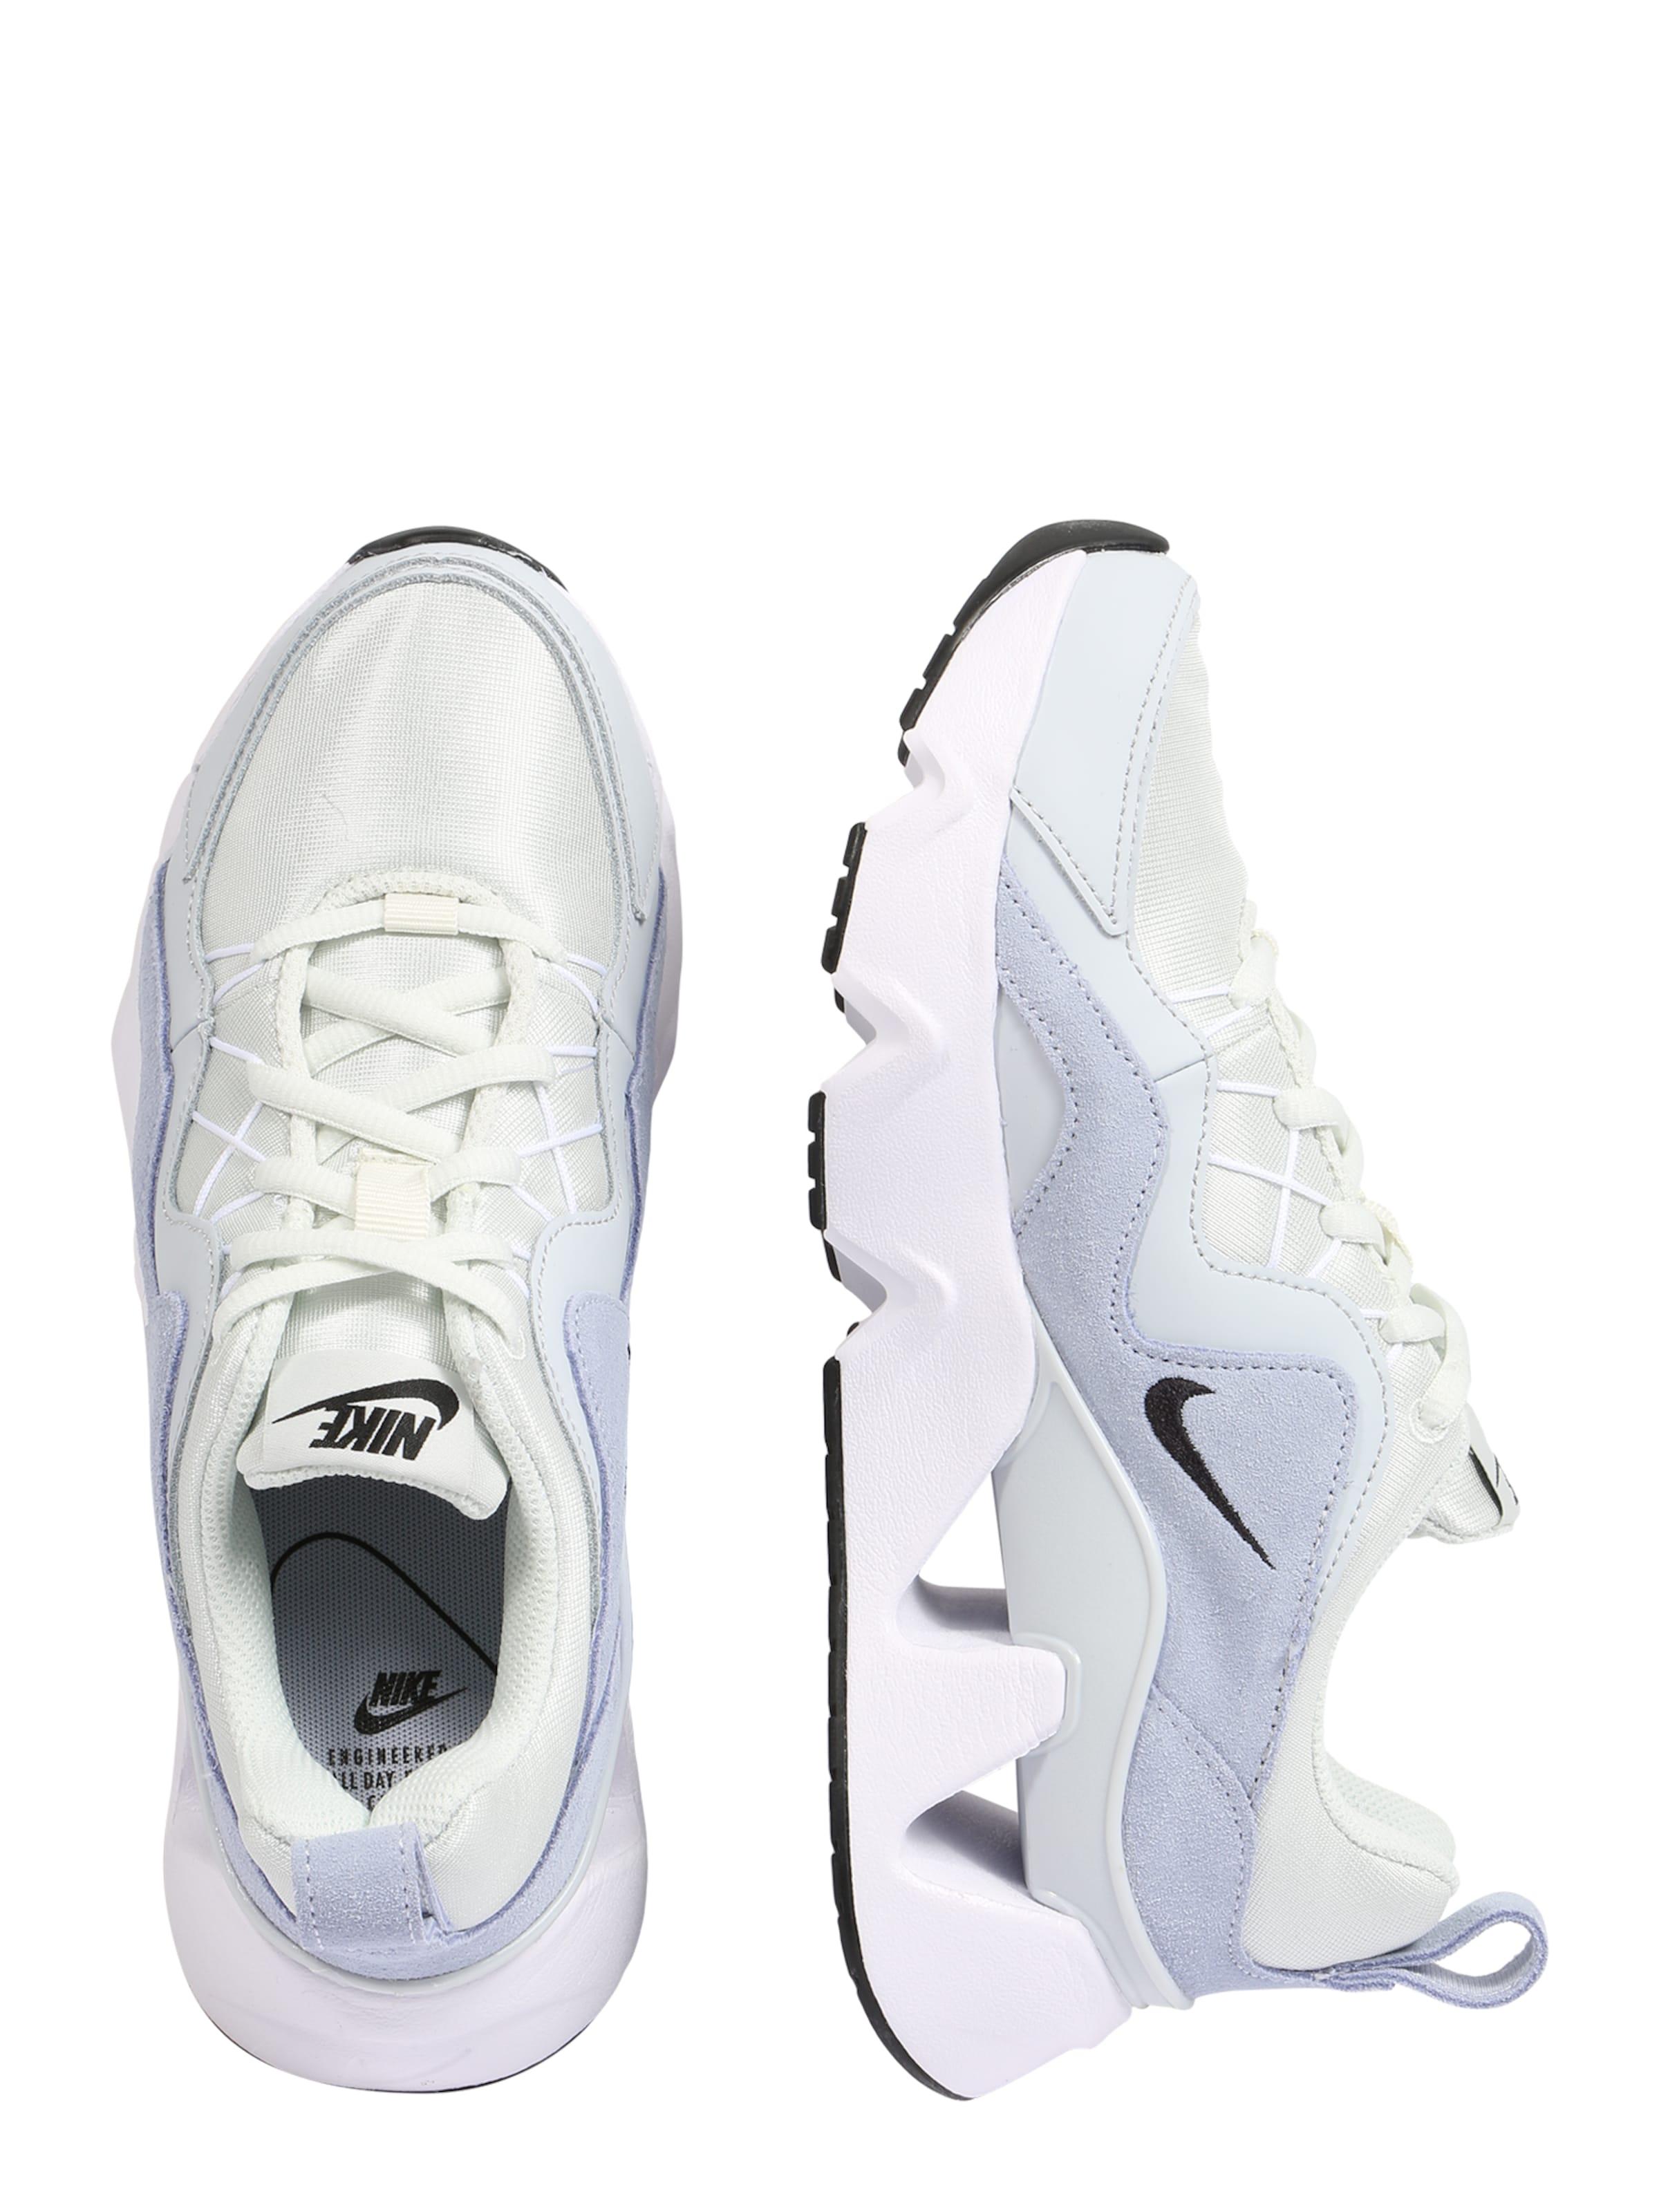 Nike Sportswear Låg sneaker 'Ryz 365' i ljusgrå / syrén / svart / vit